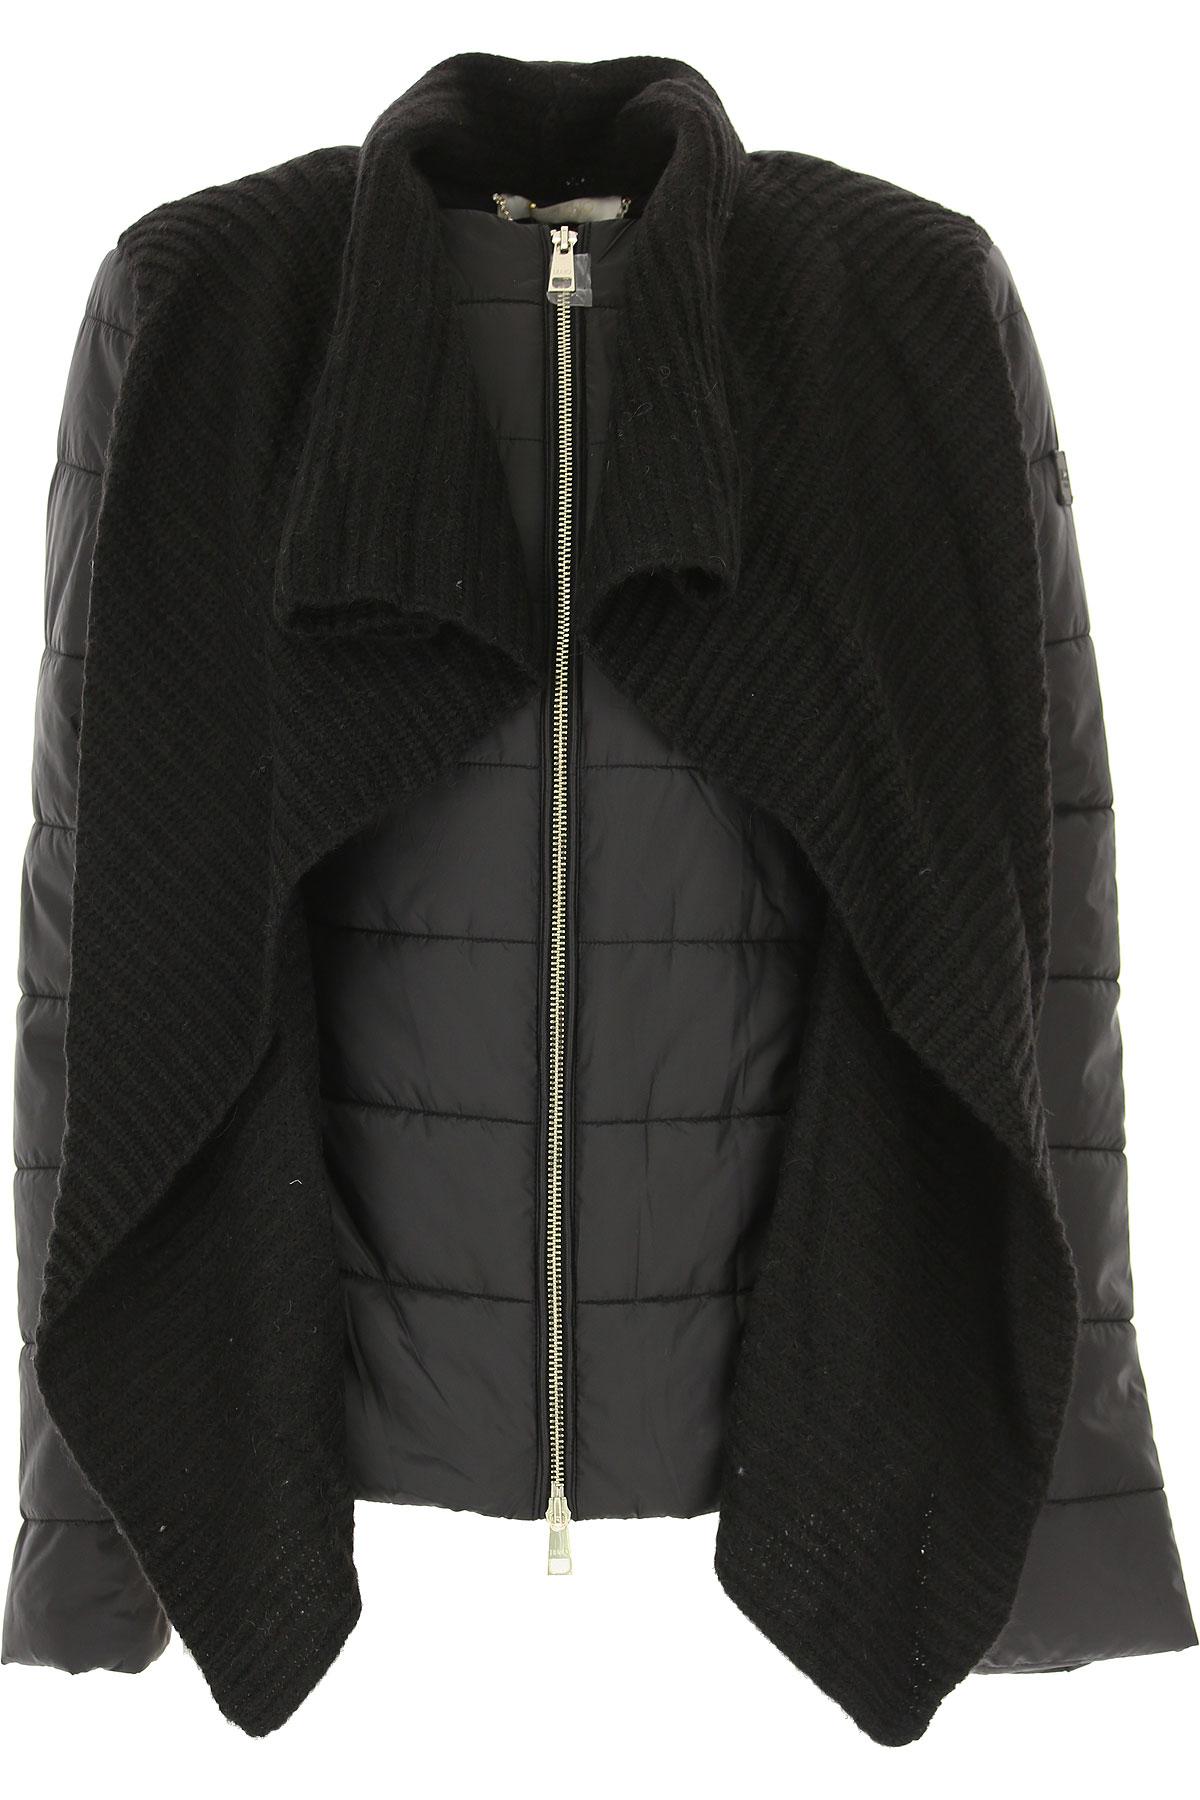 Image of Liu Jo Down Jacket for Women, Puffer Ski Jacket, Black, polyester, 2017, 4 6 8